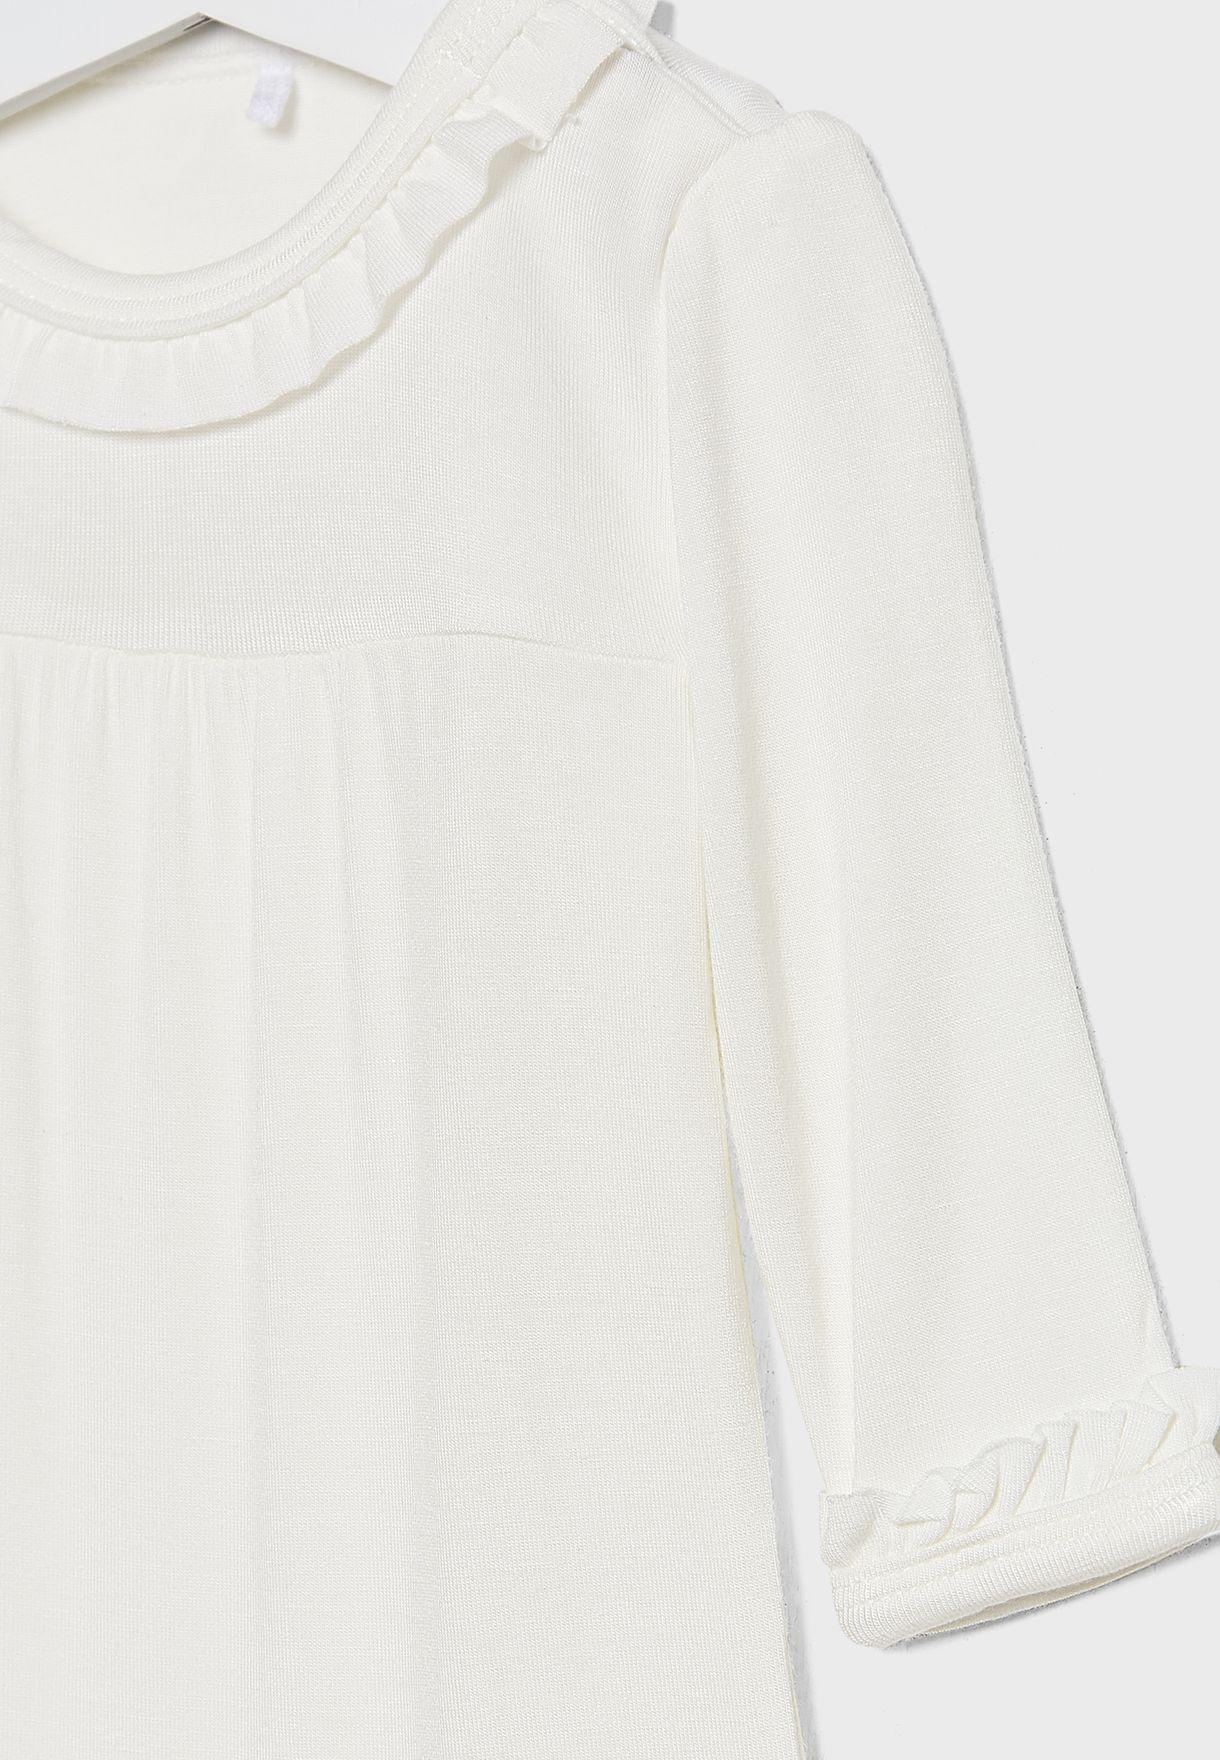 Infant Pleated Bodysuit